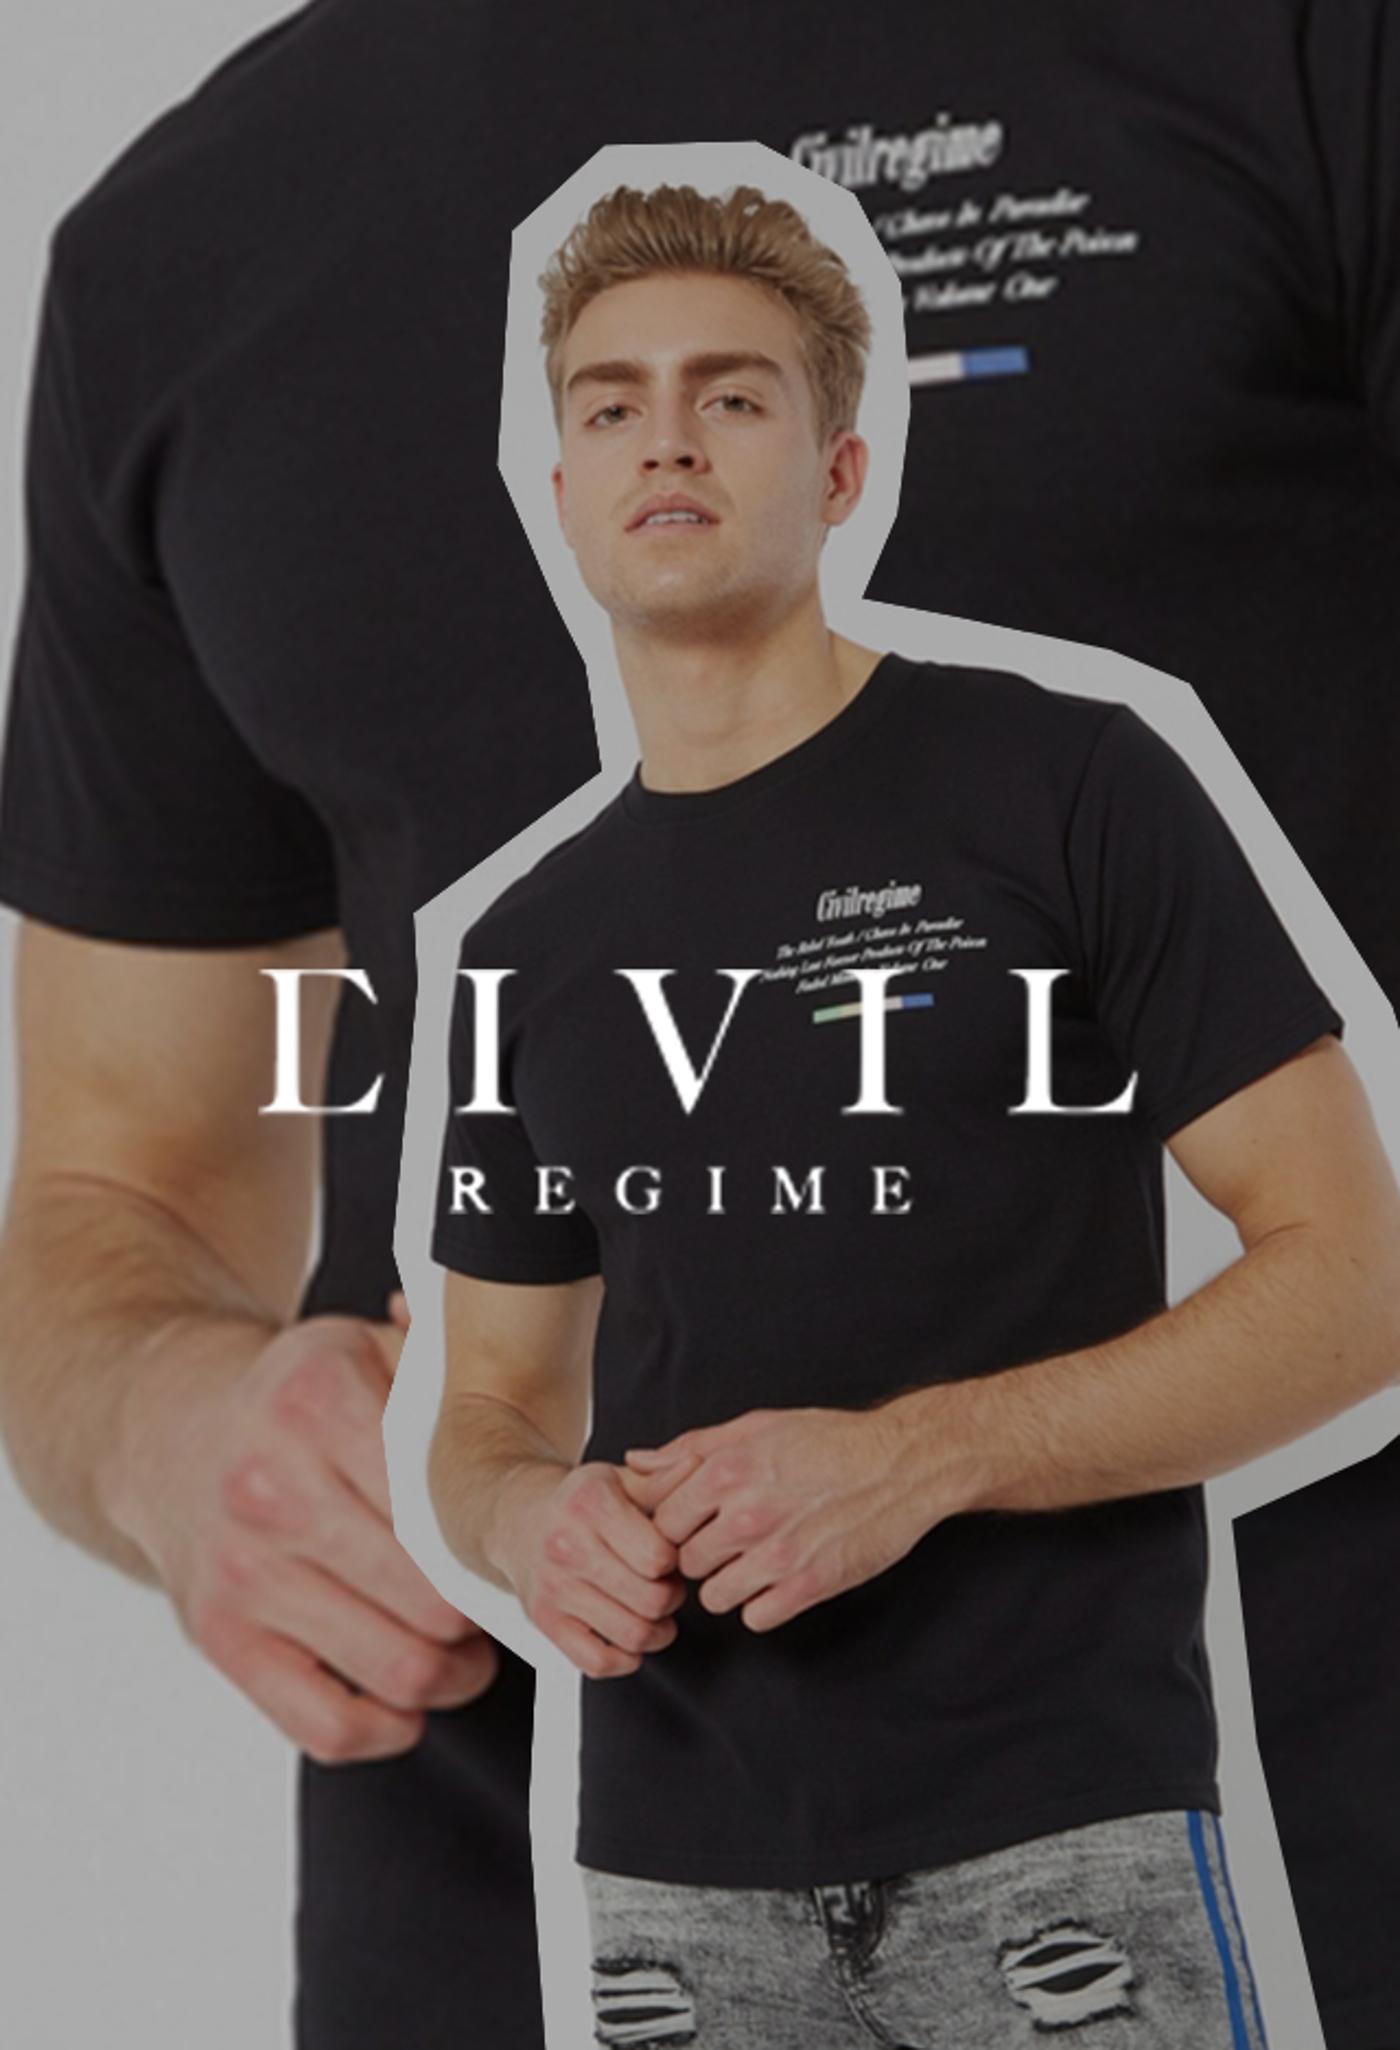 Clothing by Civil Regime